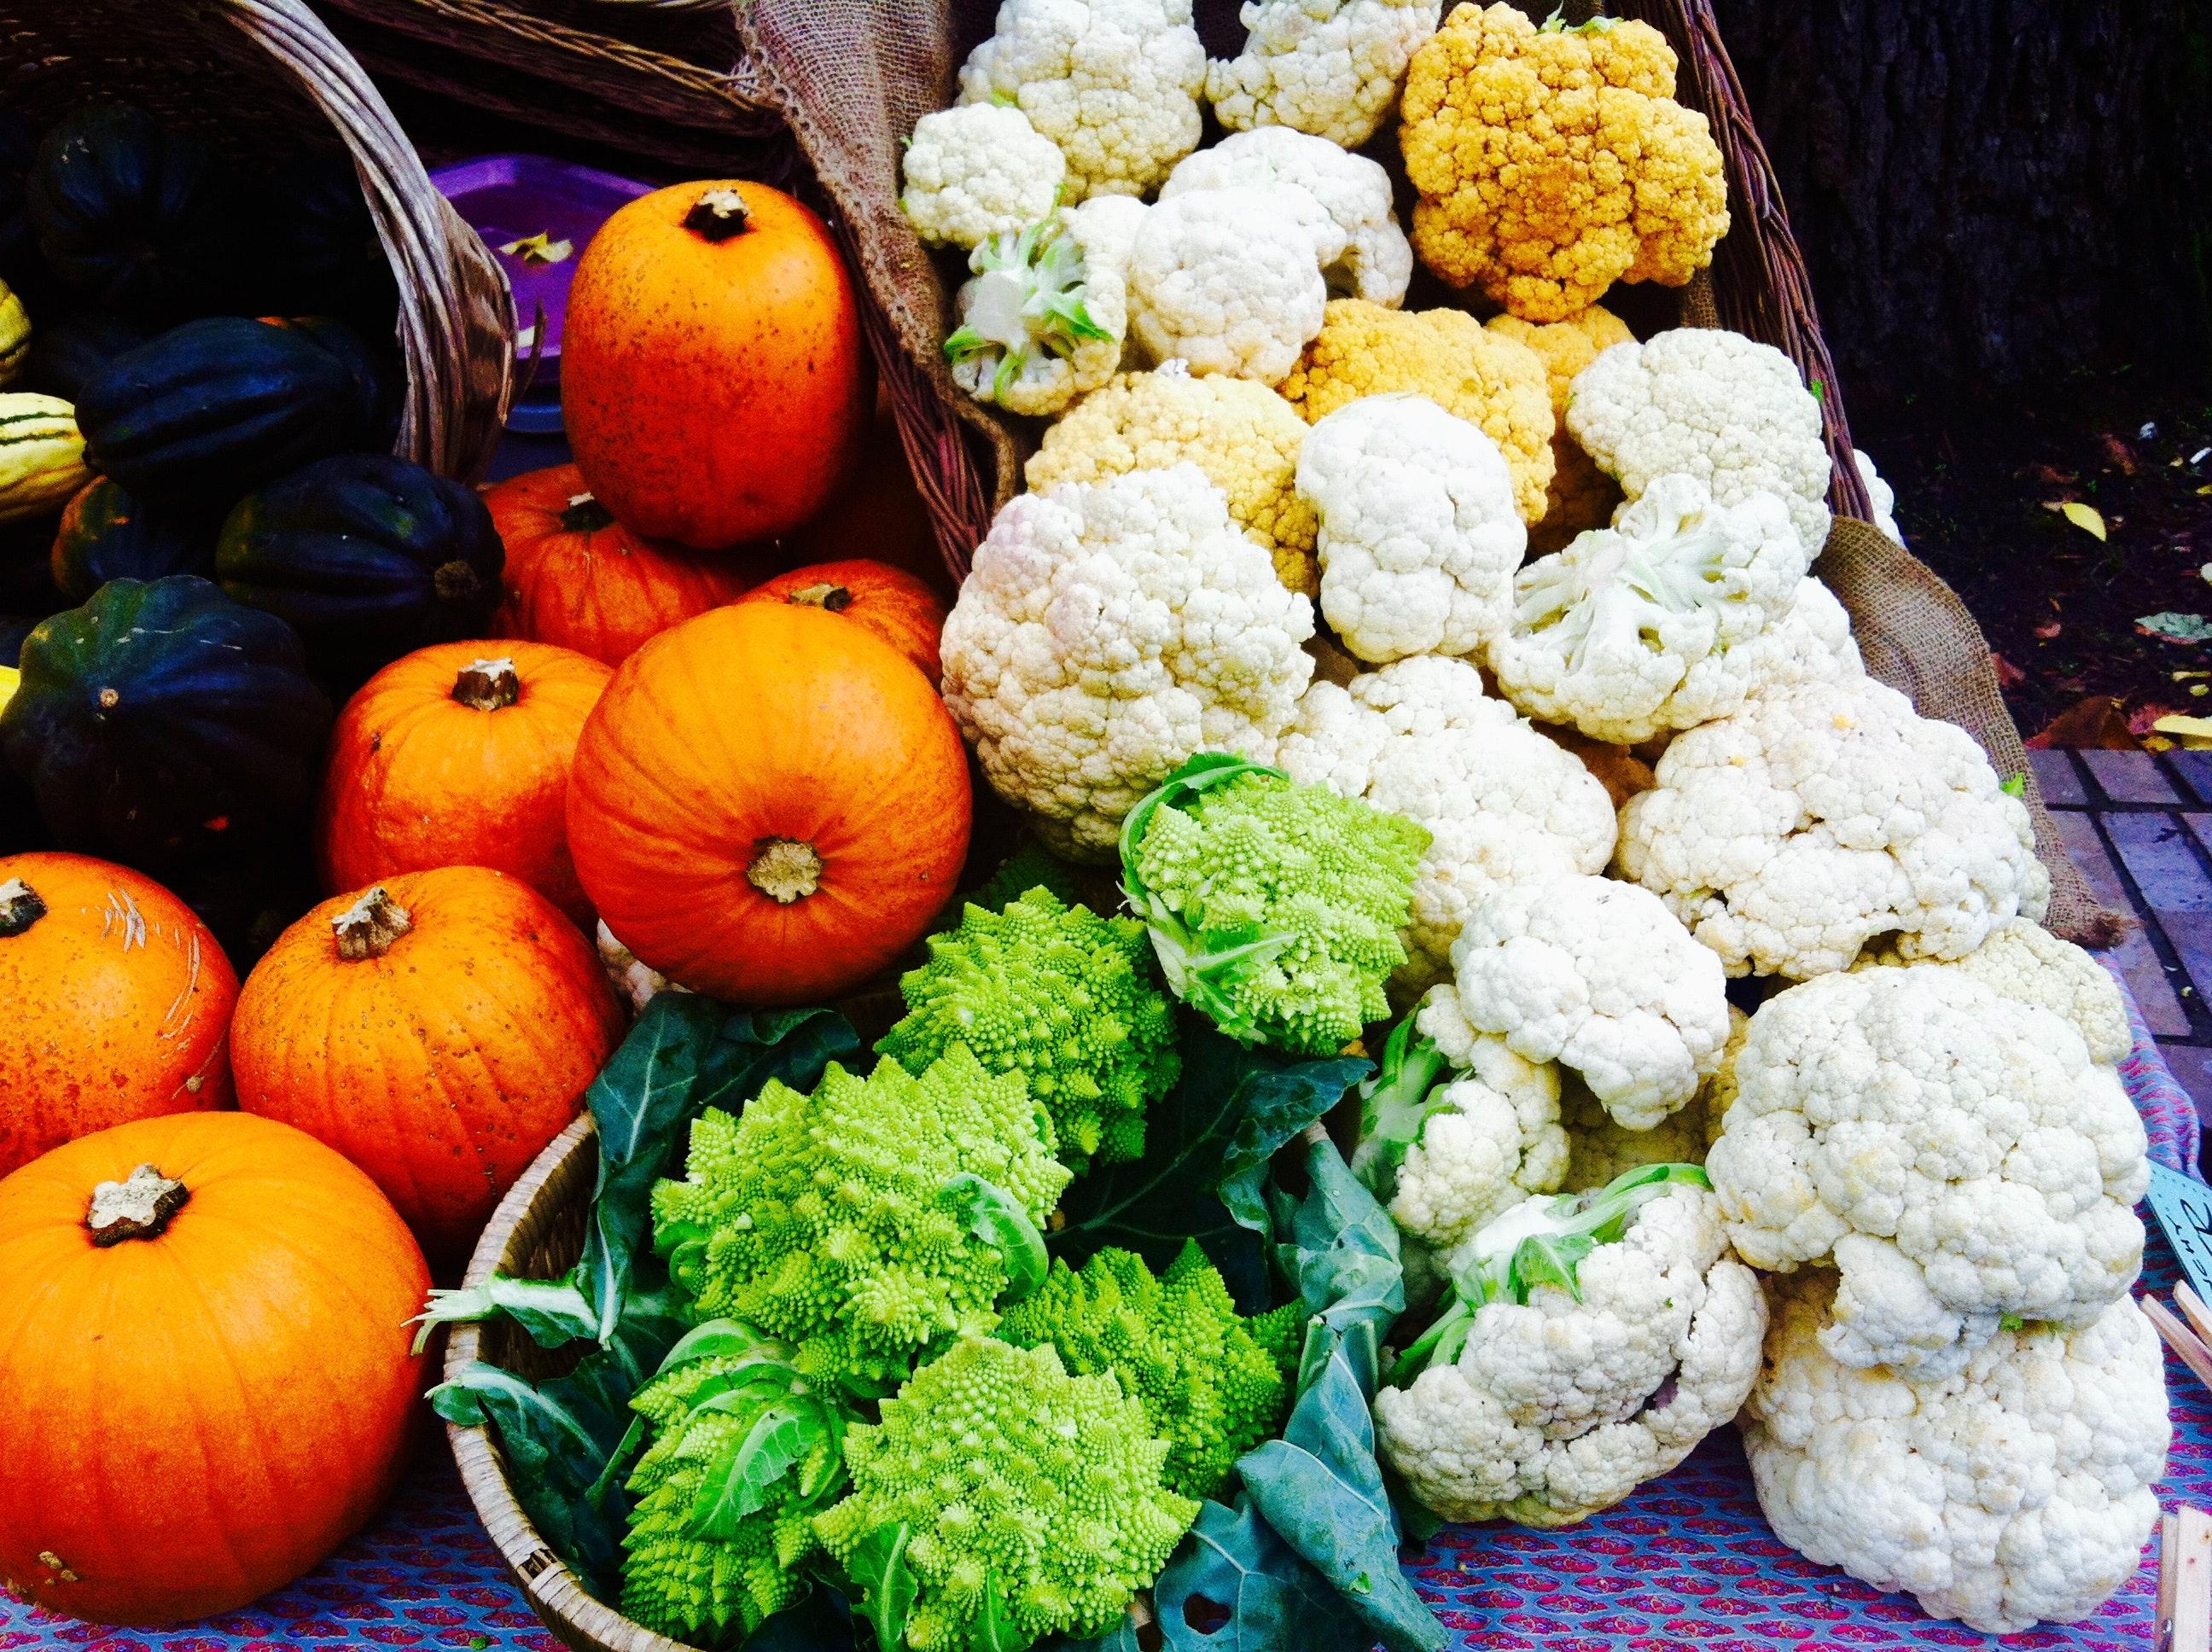 Free stock photo of farm produce, fresh produce, fresh vegetables